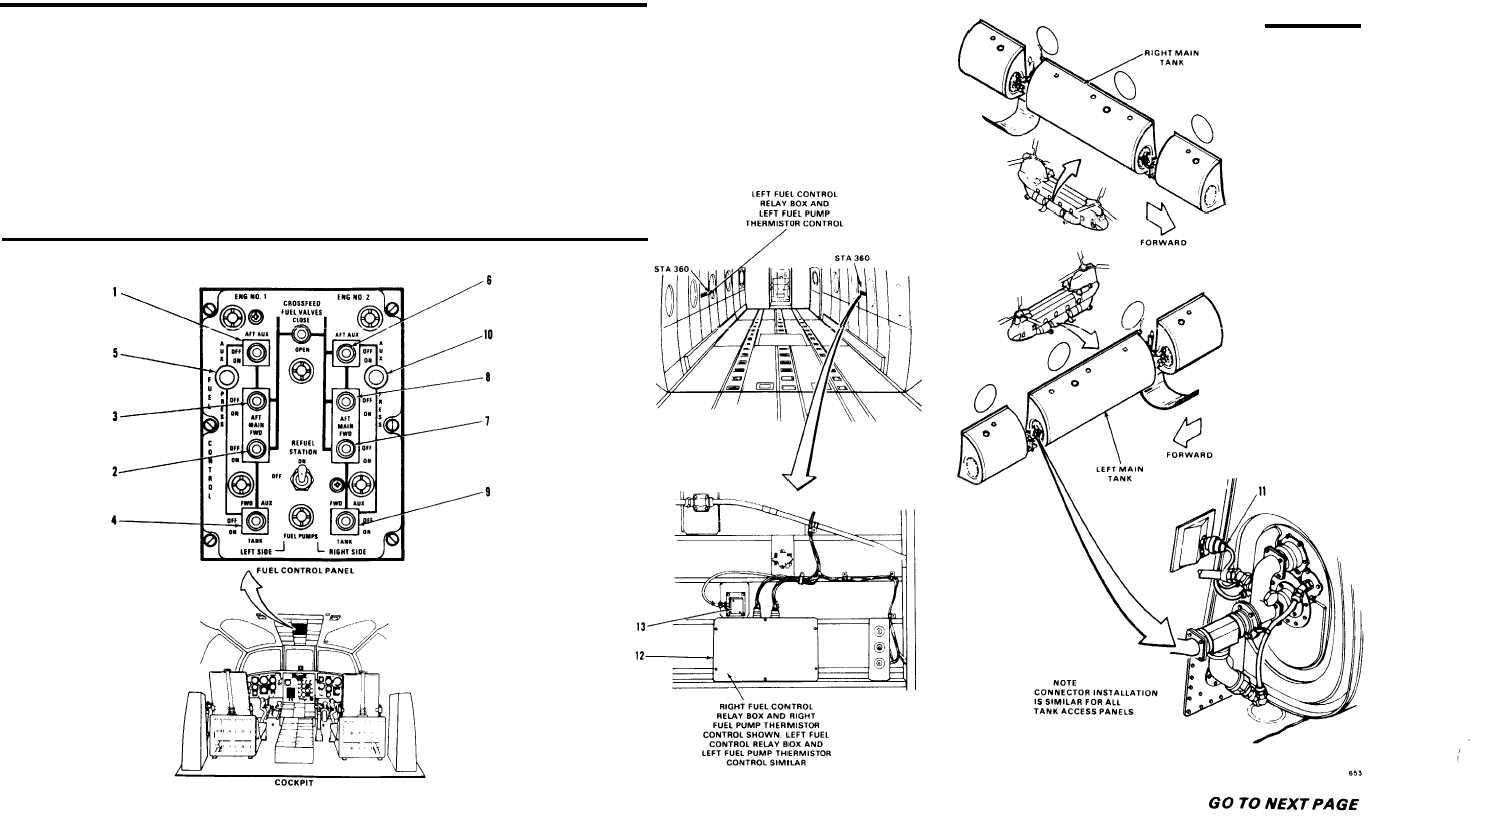 Fuel Boost Pump System Visual Check